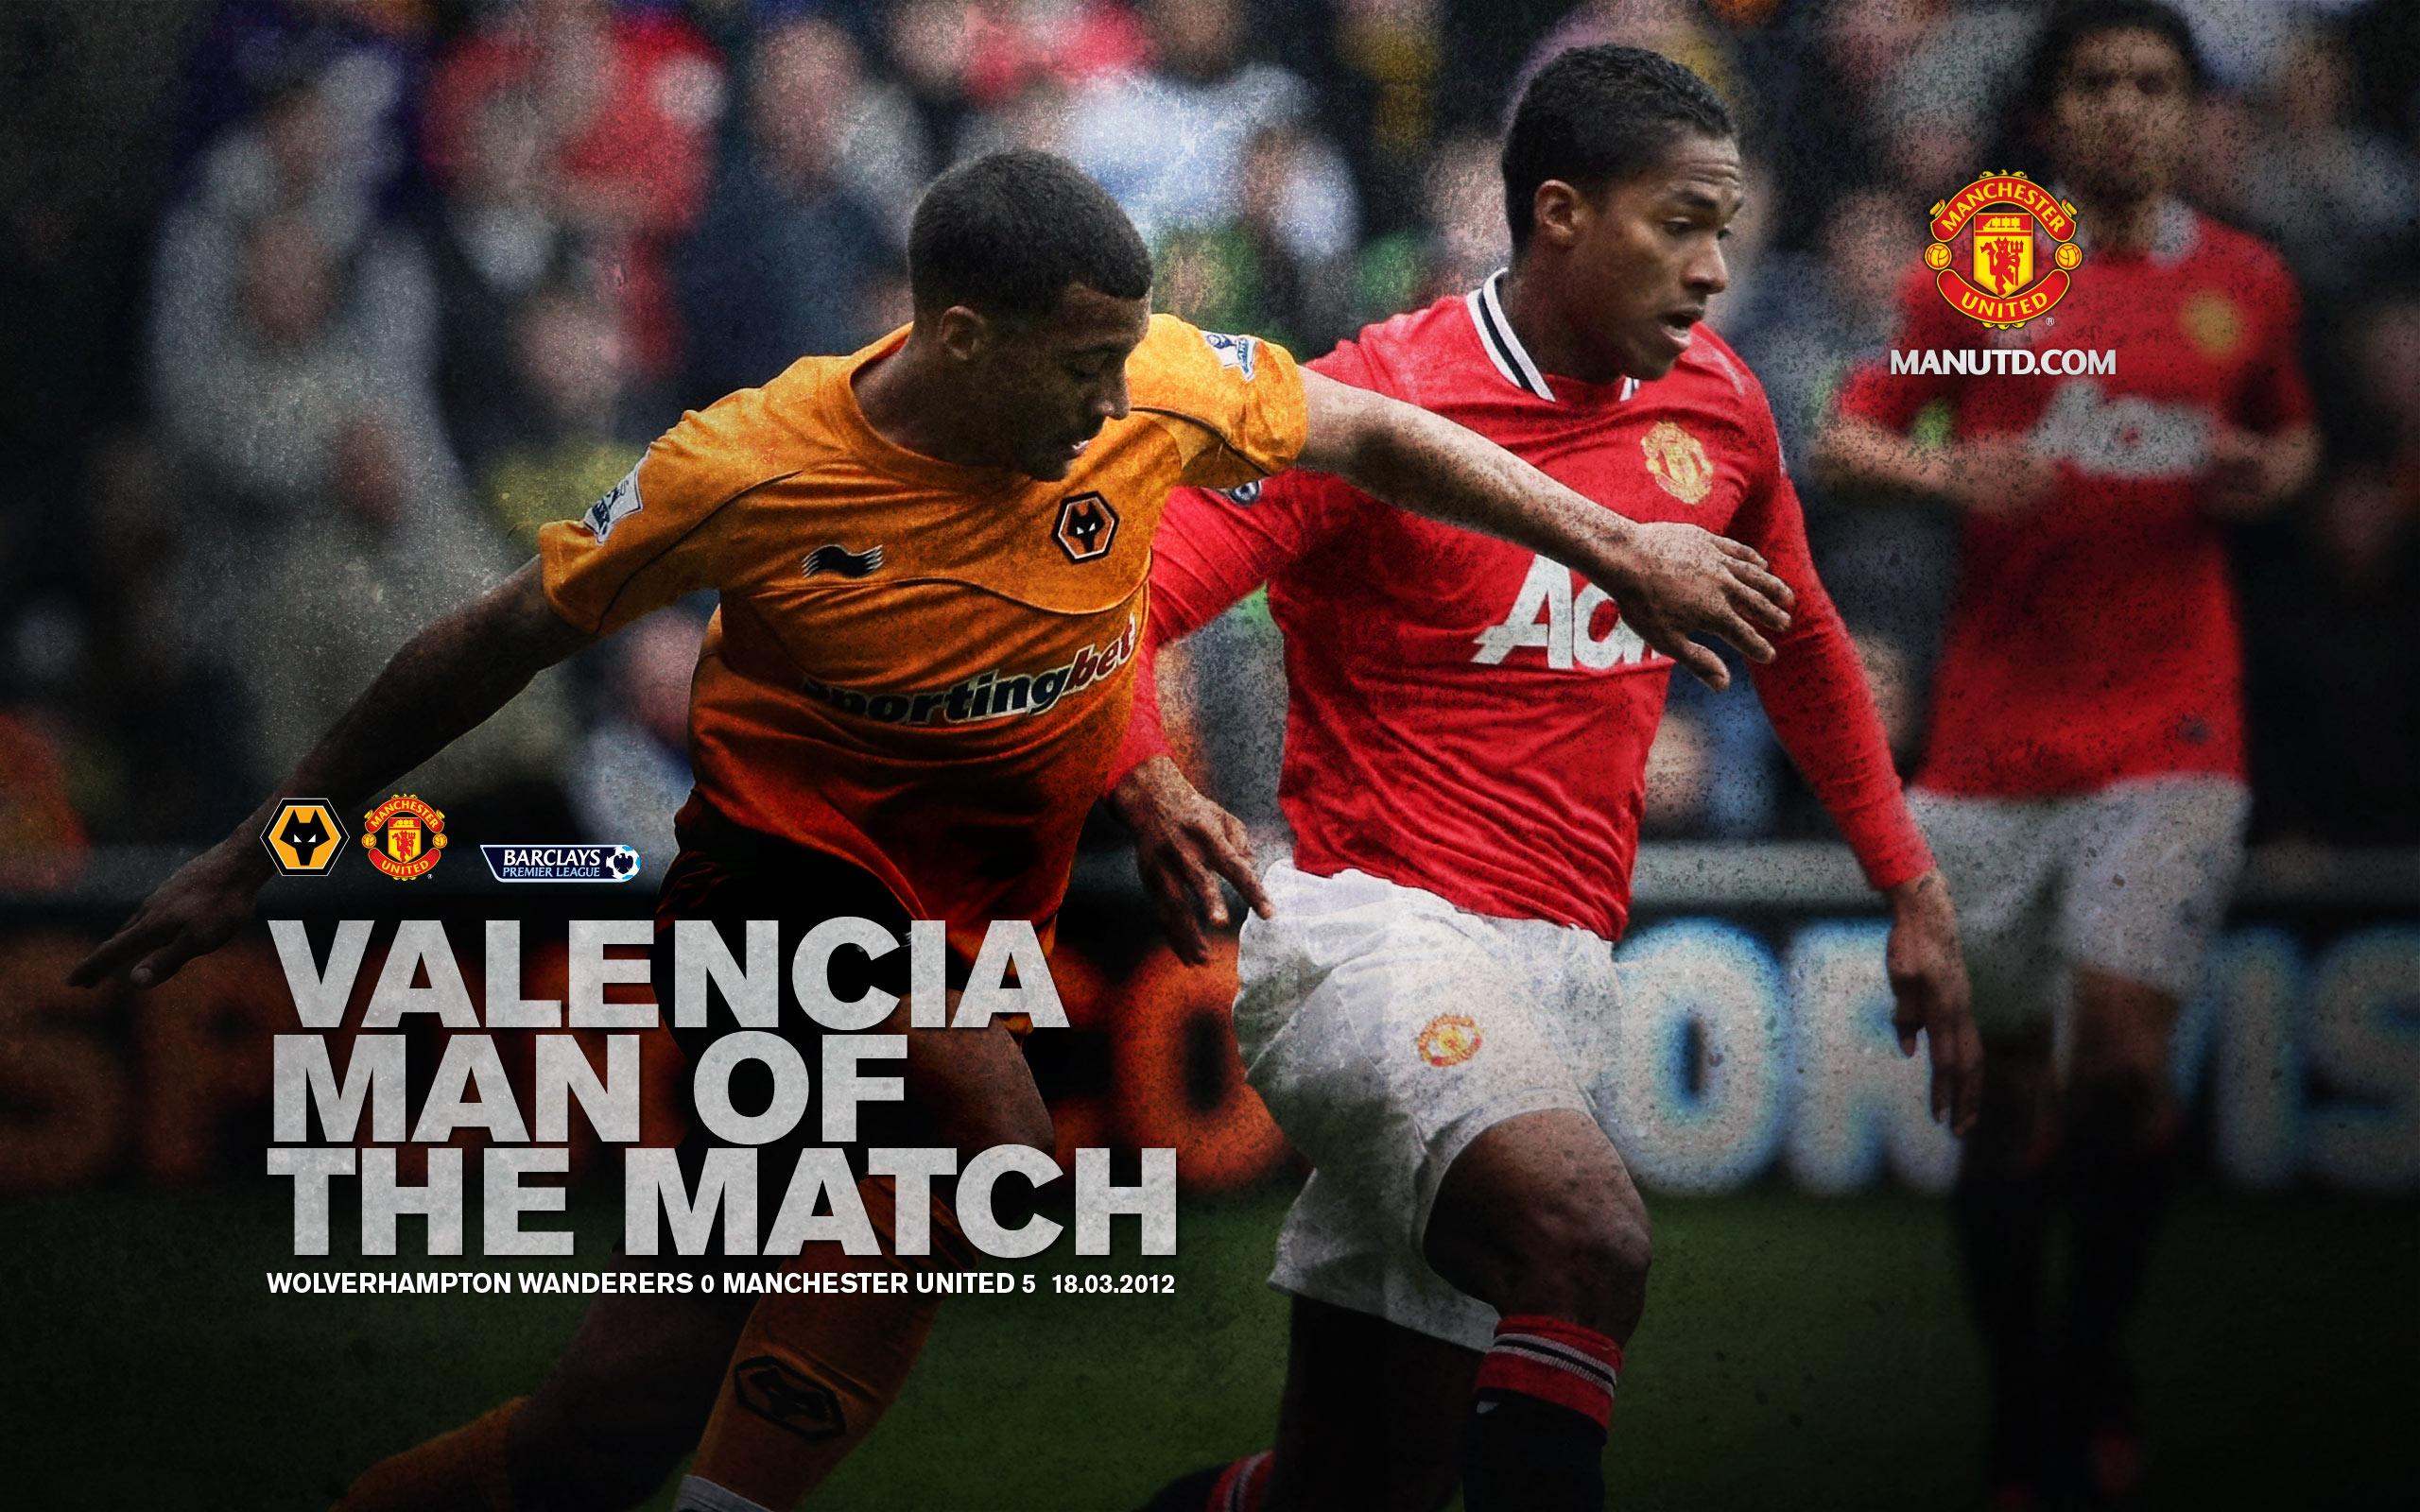 Valencia - MOTM v Wolves